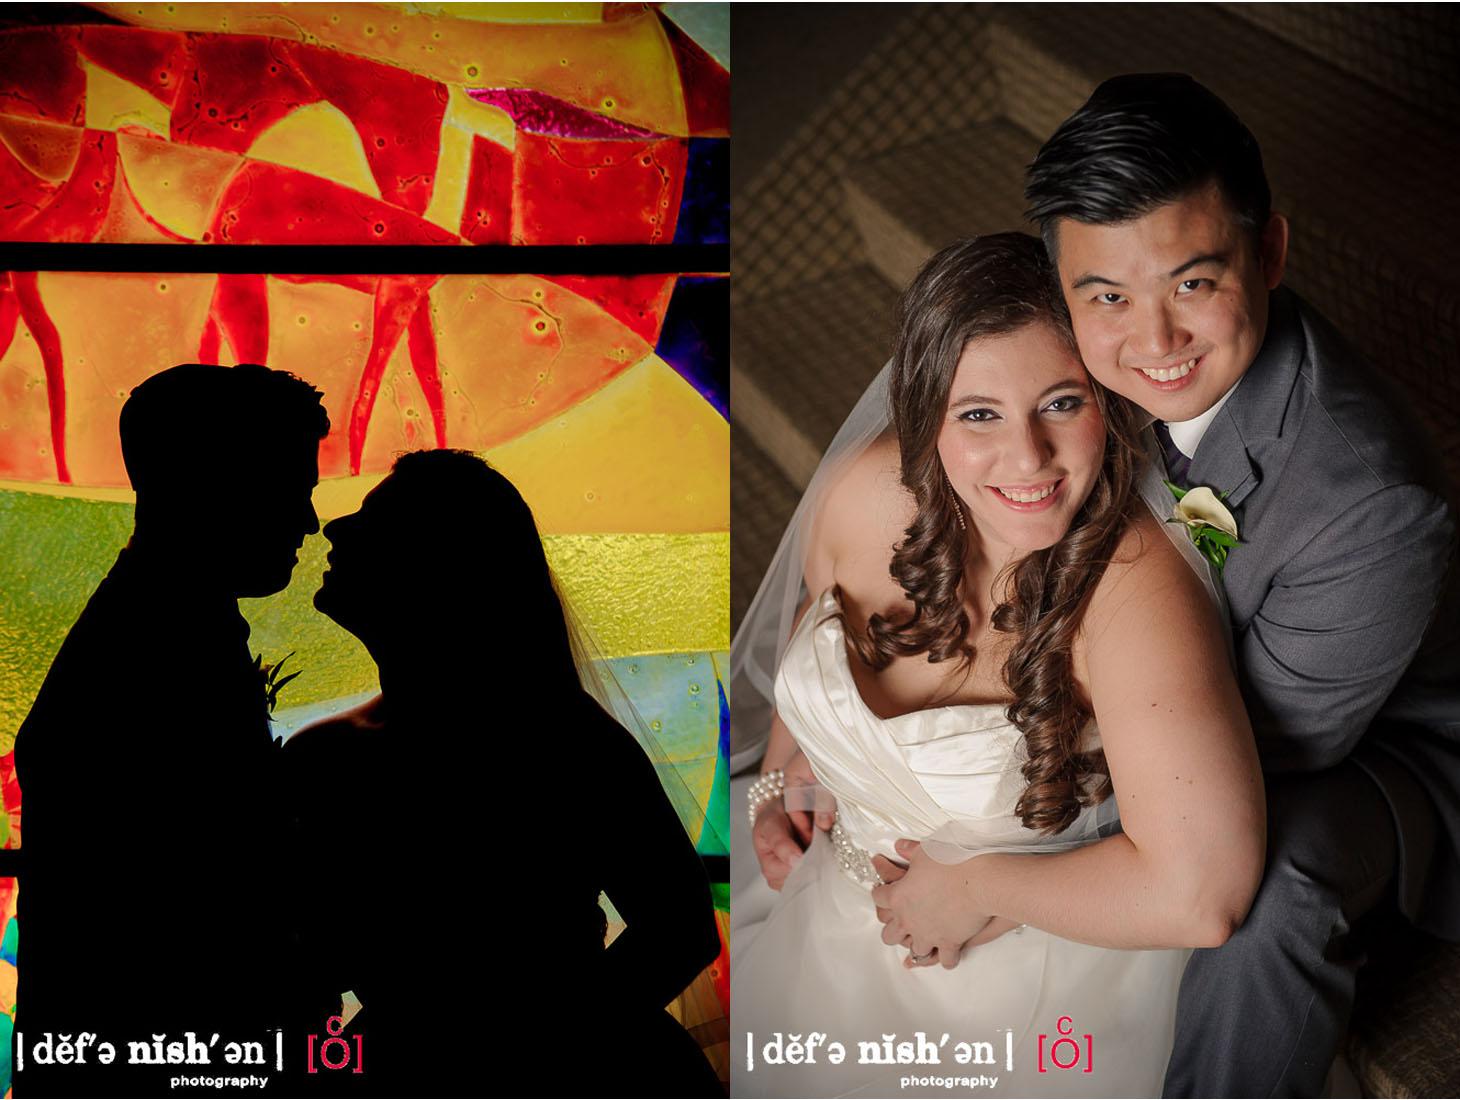 Definition Photography - Beth Emmeth Wedding - Toronto Ontario(13).jpg